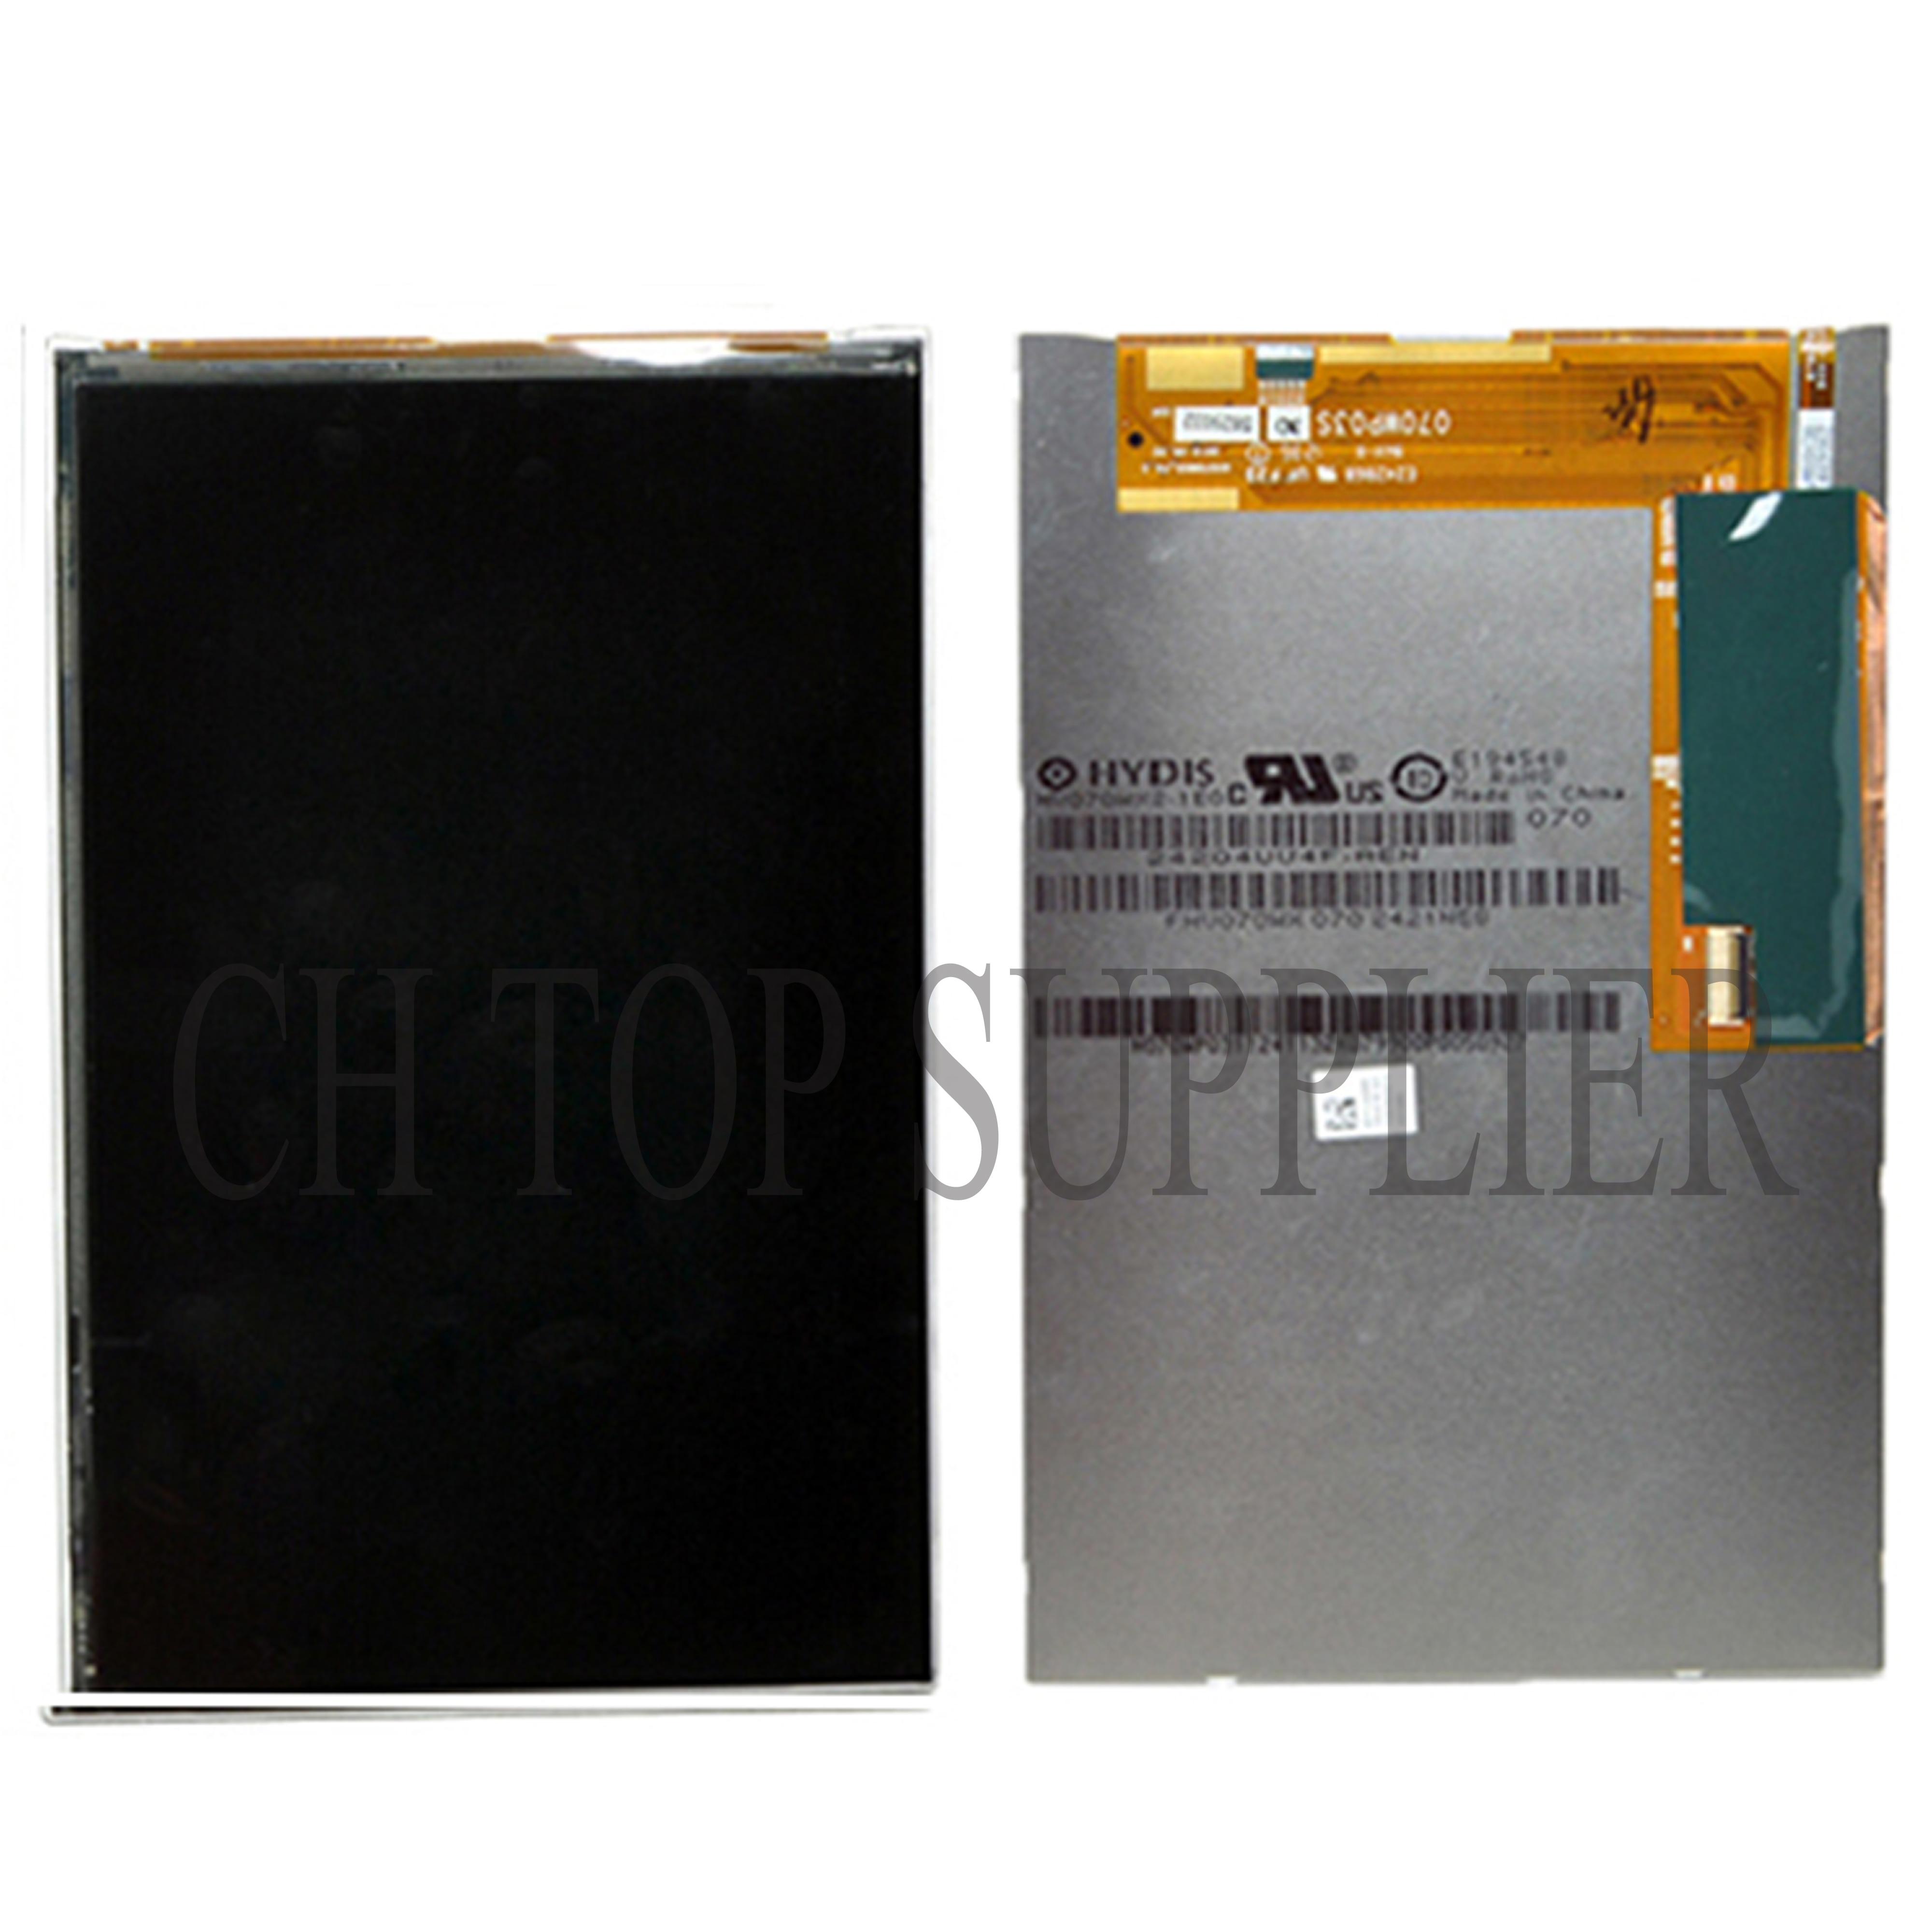 все цены на (Ref:CLAA070WP03 XG/070WP03S)7 inch for Ainol NOVO7 Myth Quad-core JXD S7800 Tablet Display screen ,IPS lcd screen(1280*800)